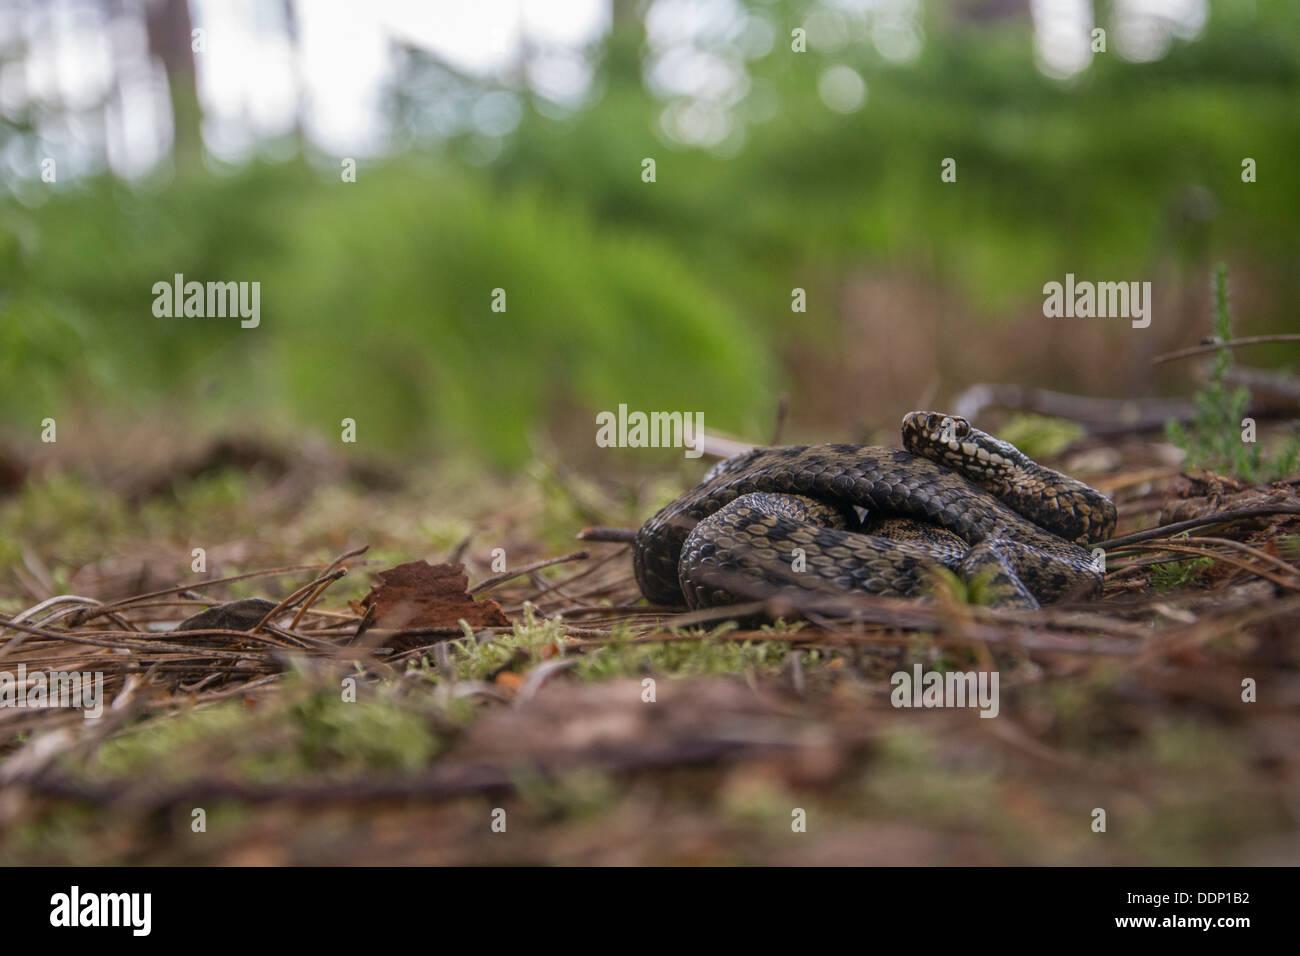 Basking adder - Stock Image